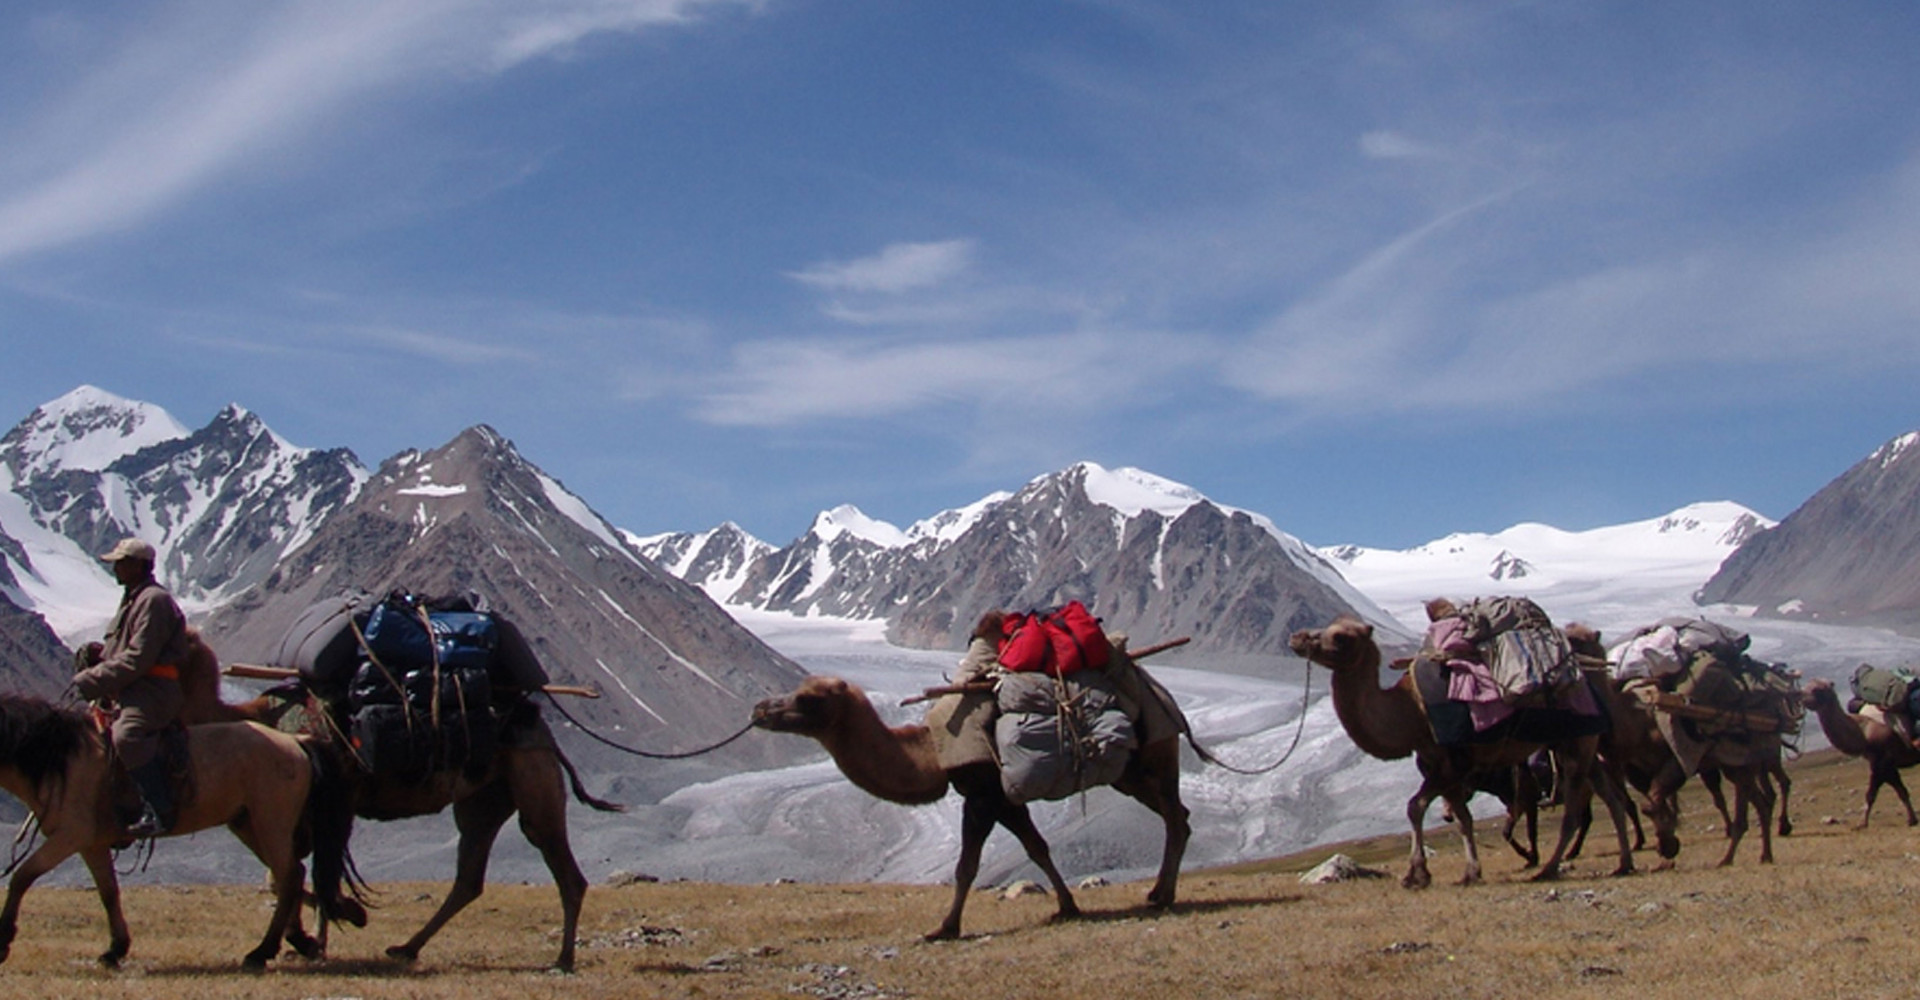 Altai Tavanbogd Natural Park